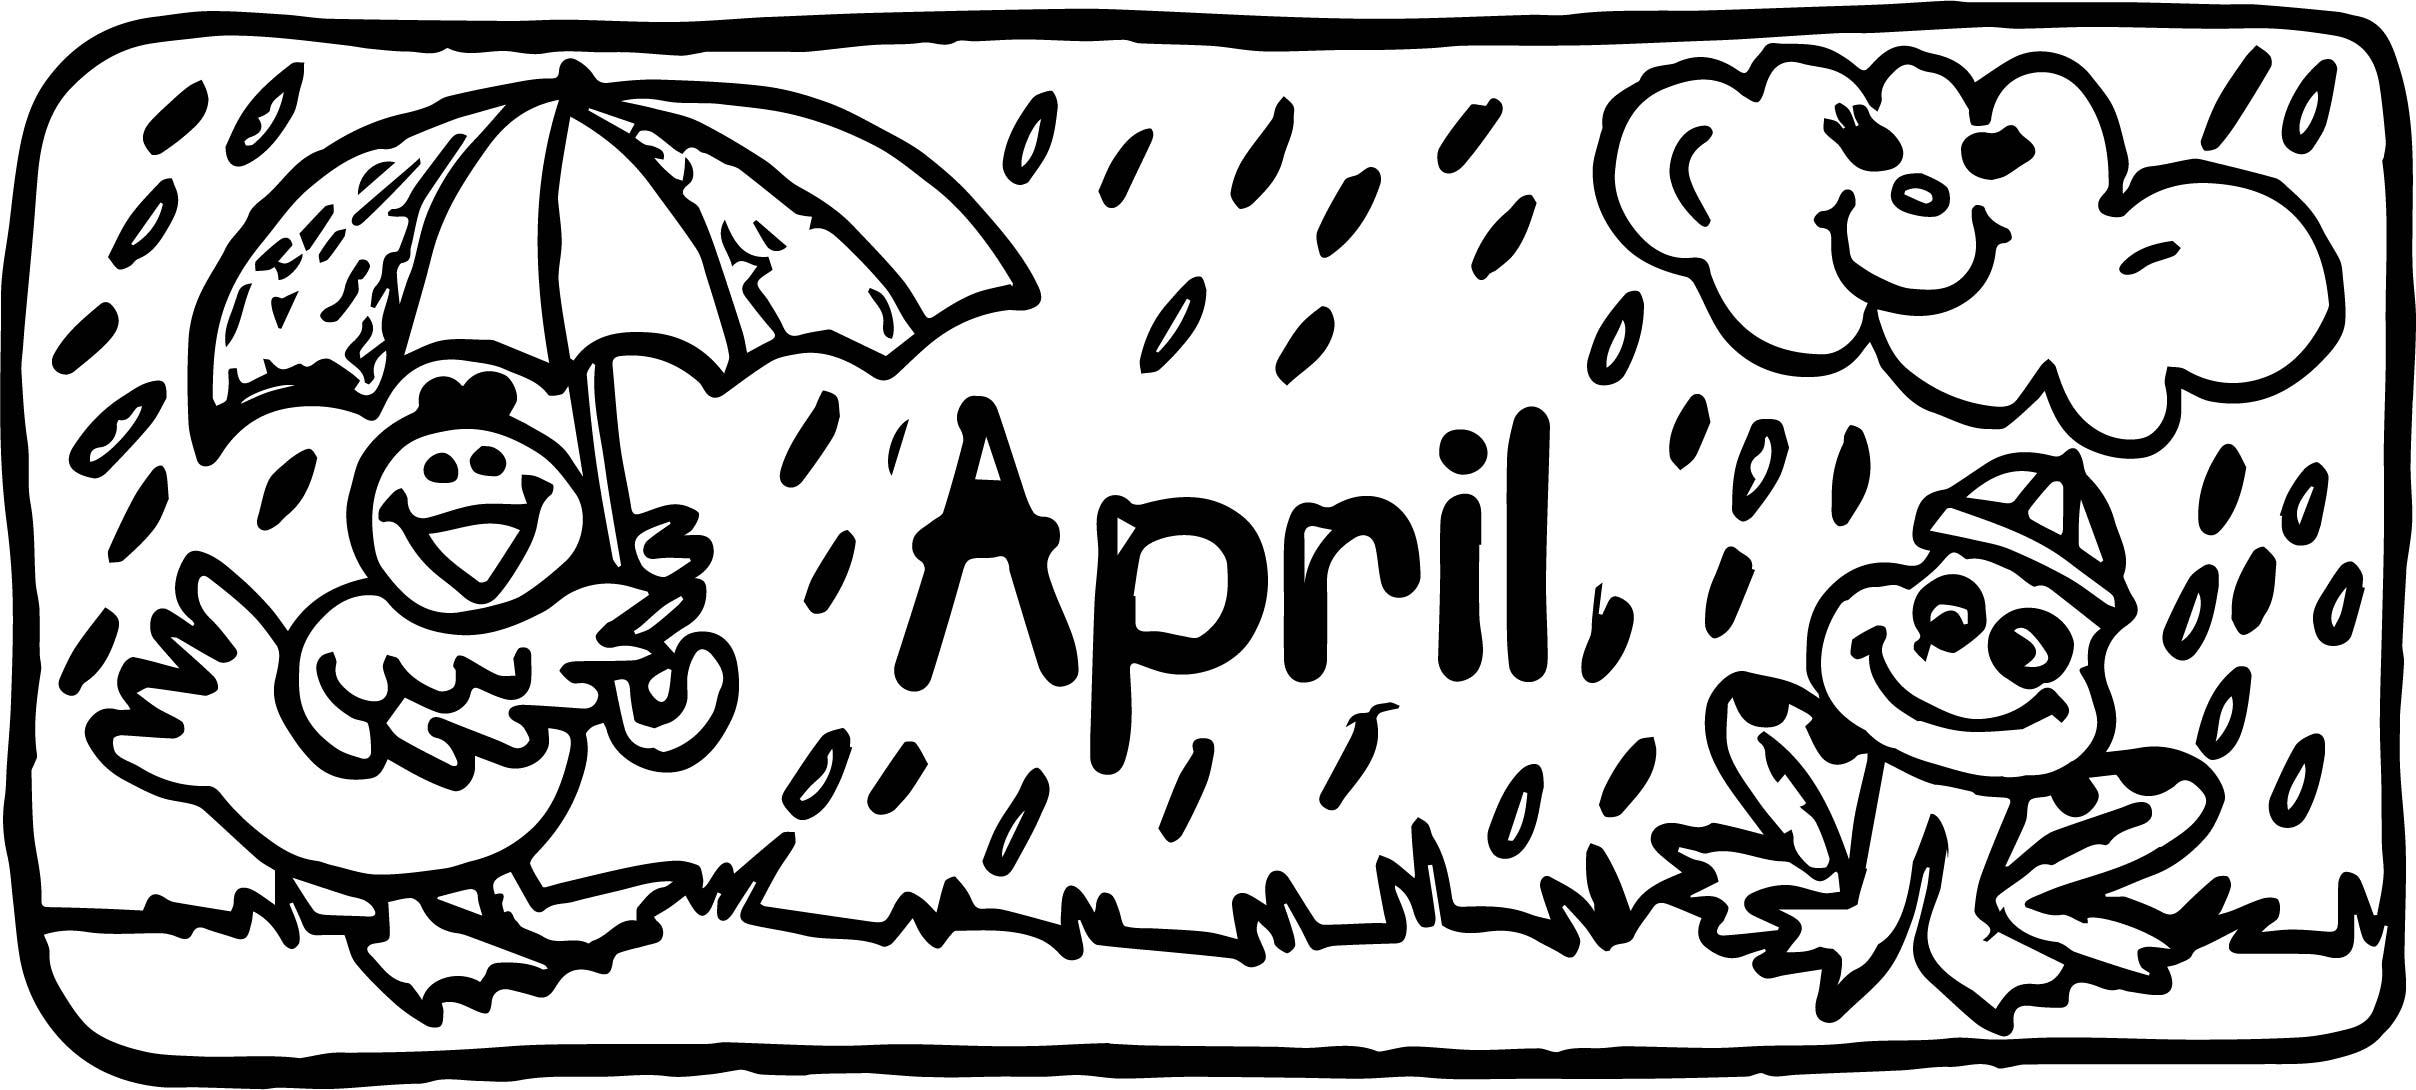 April Kids Borders Coloring Page